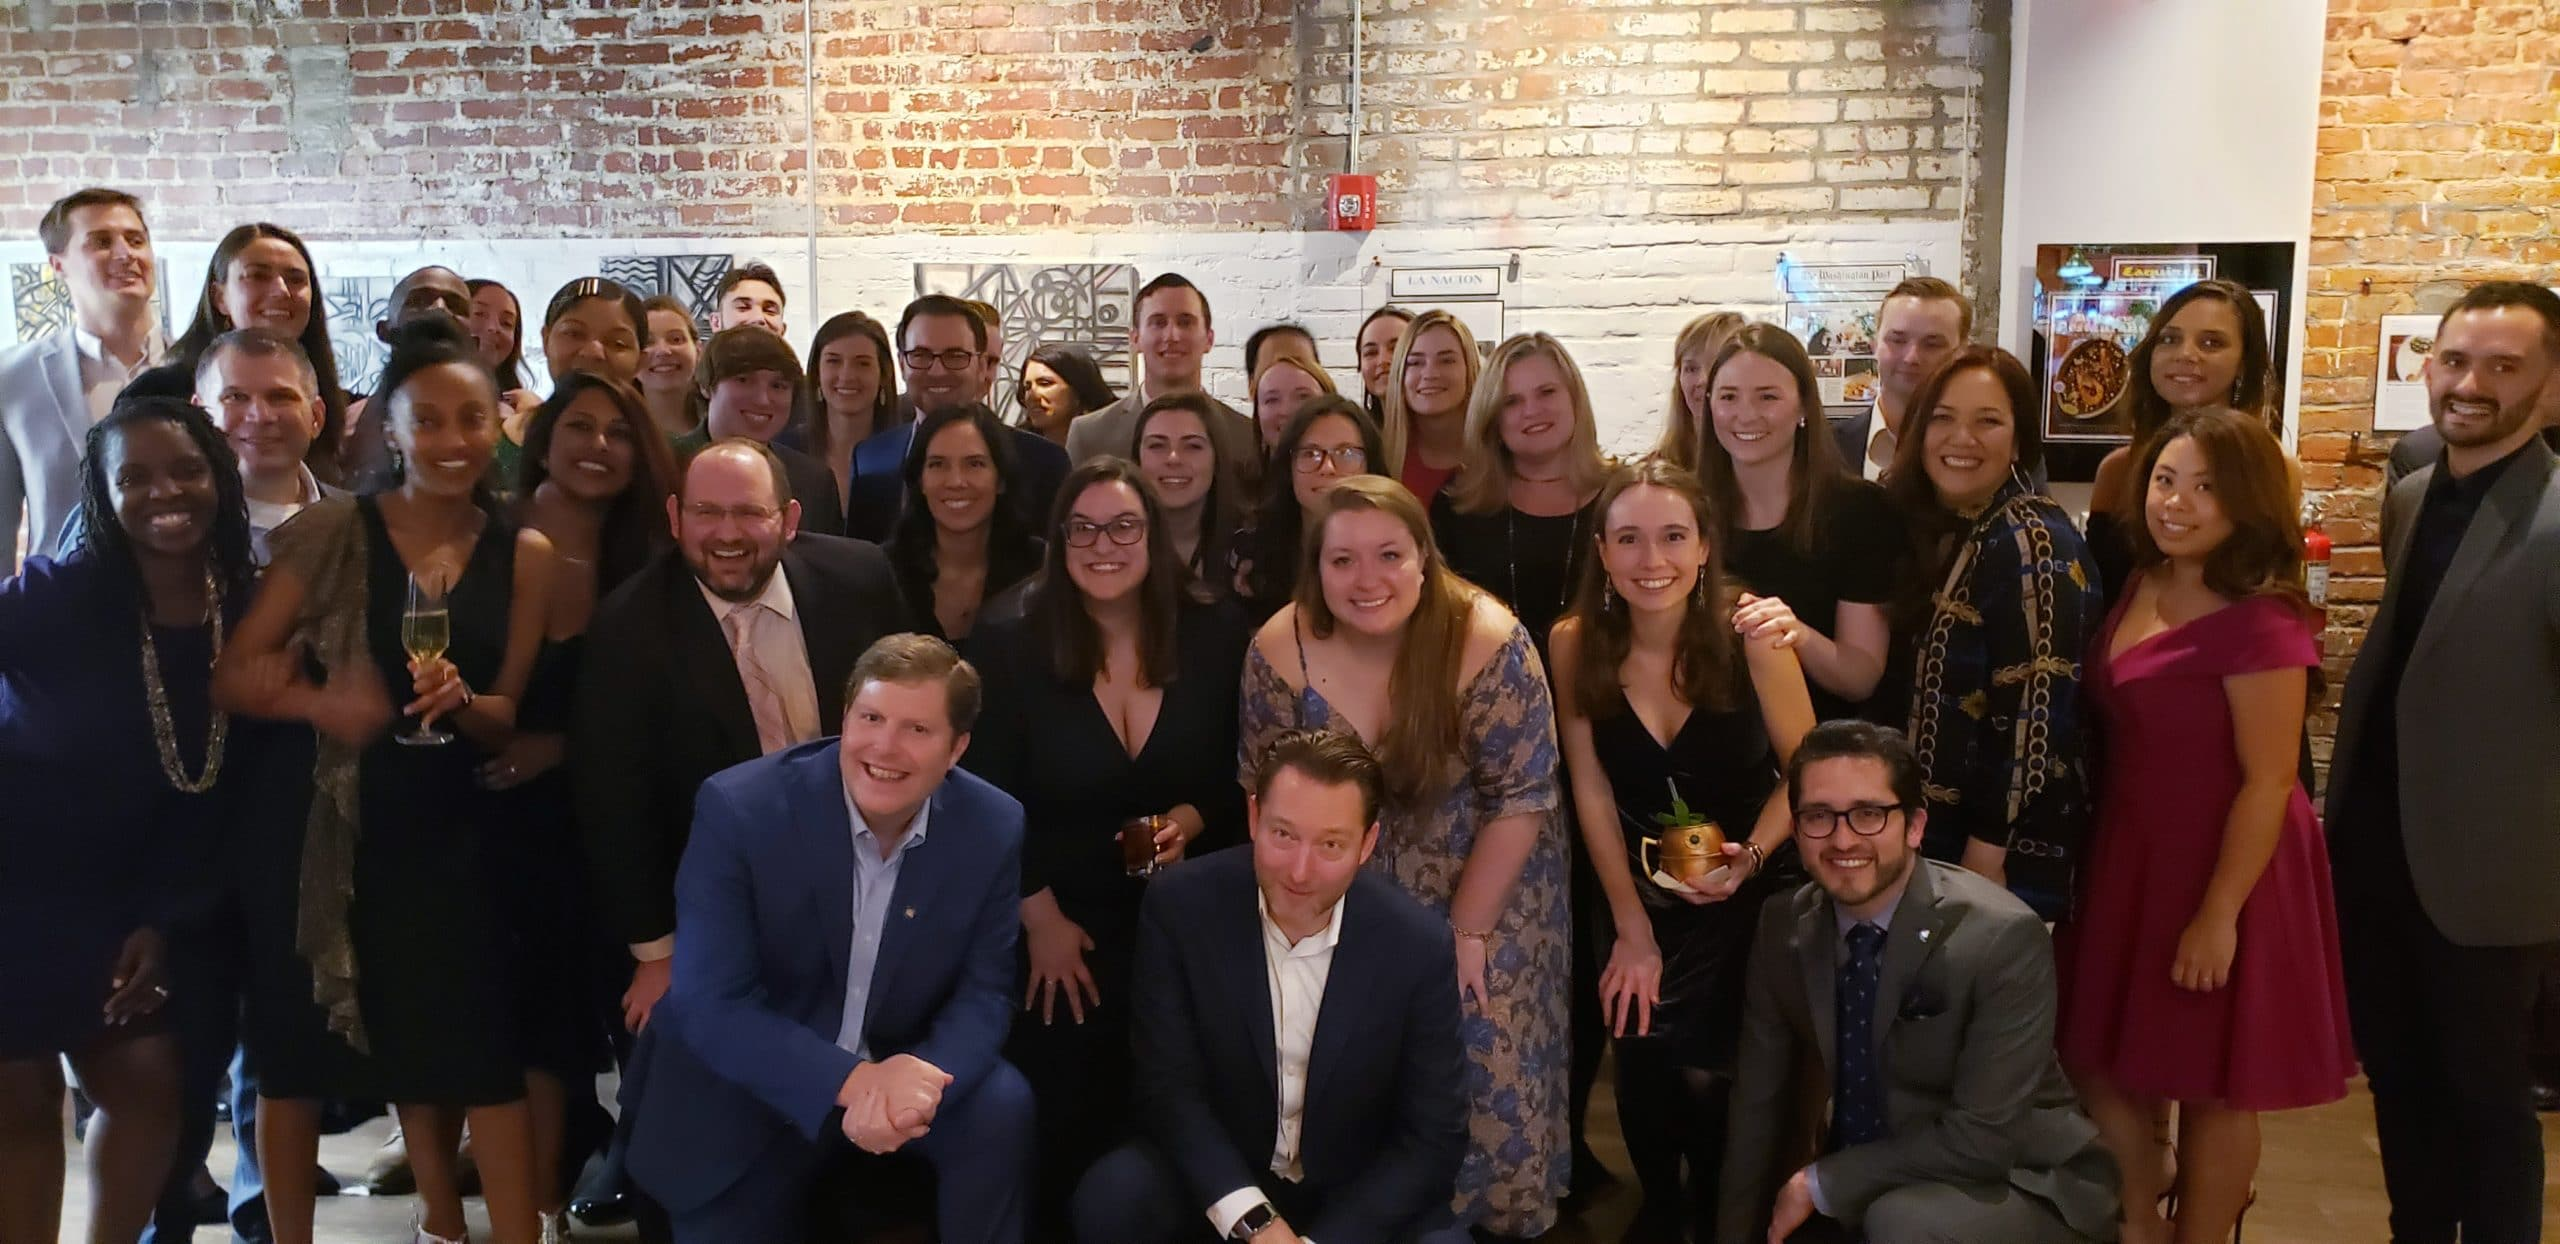 The EK Team at our annual company gala